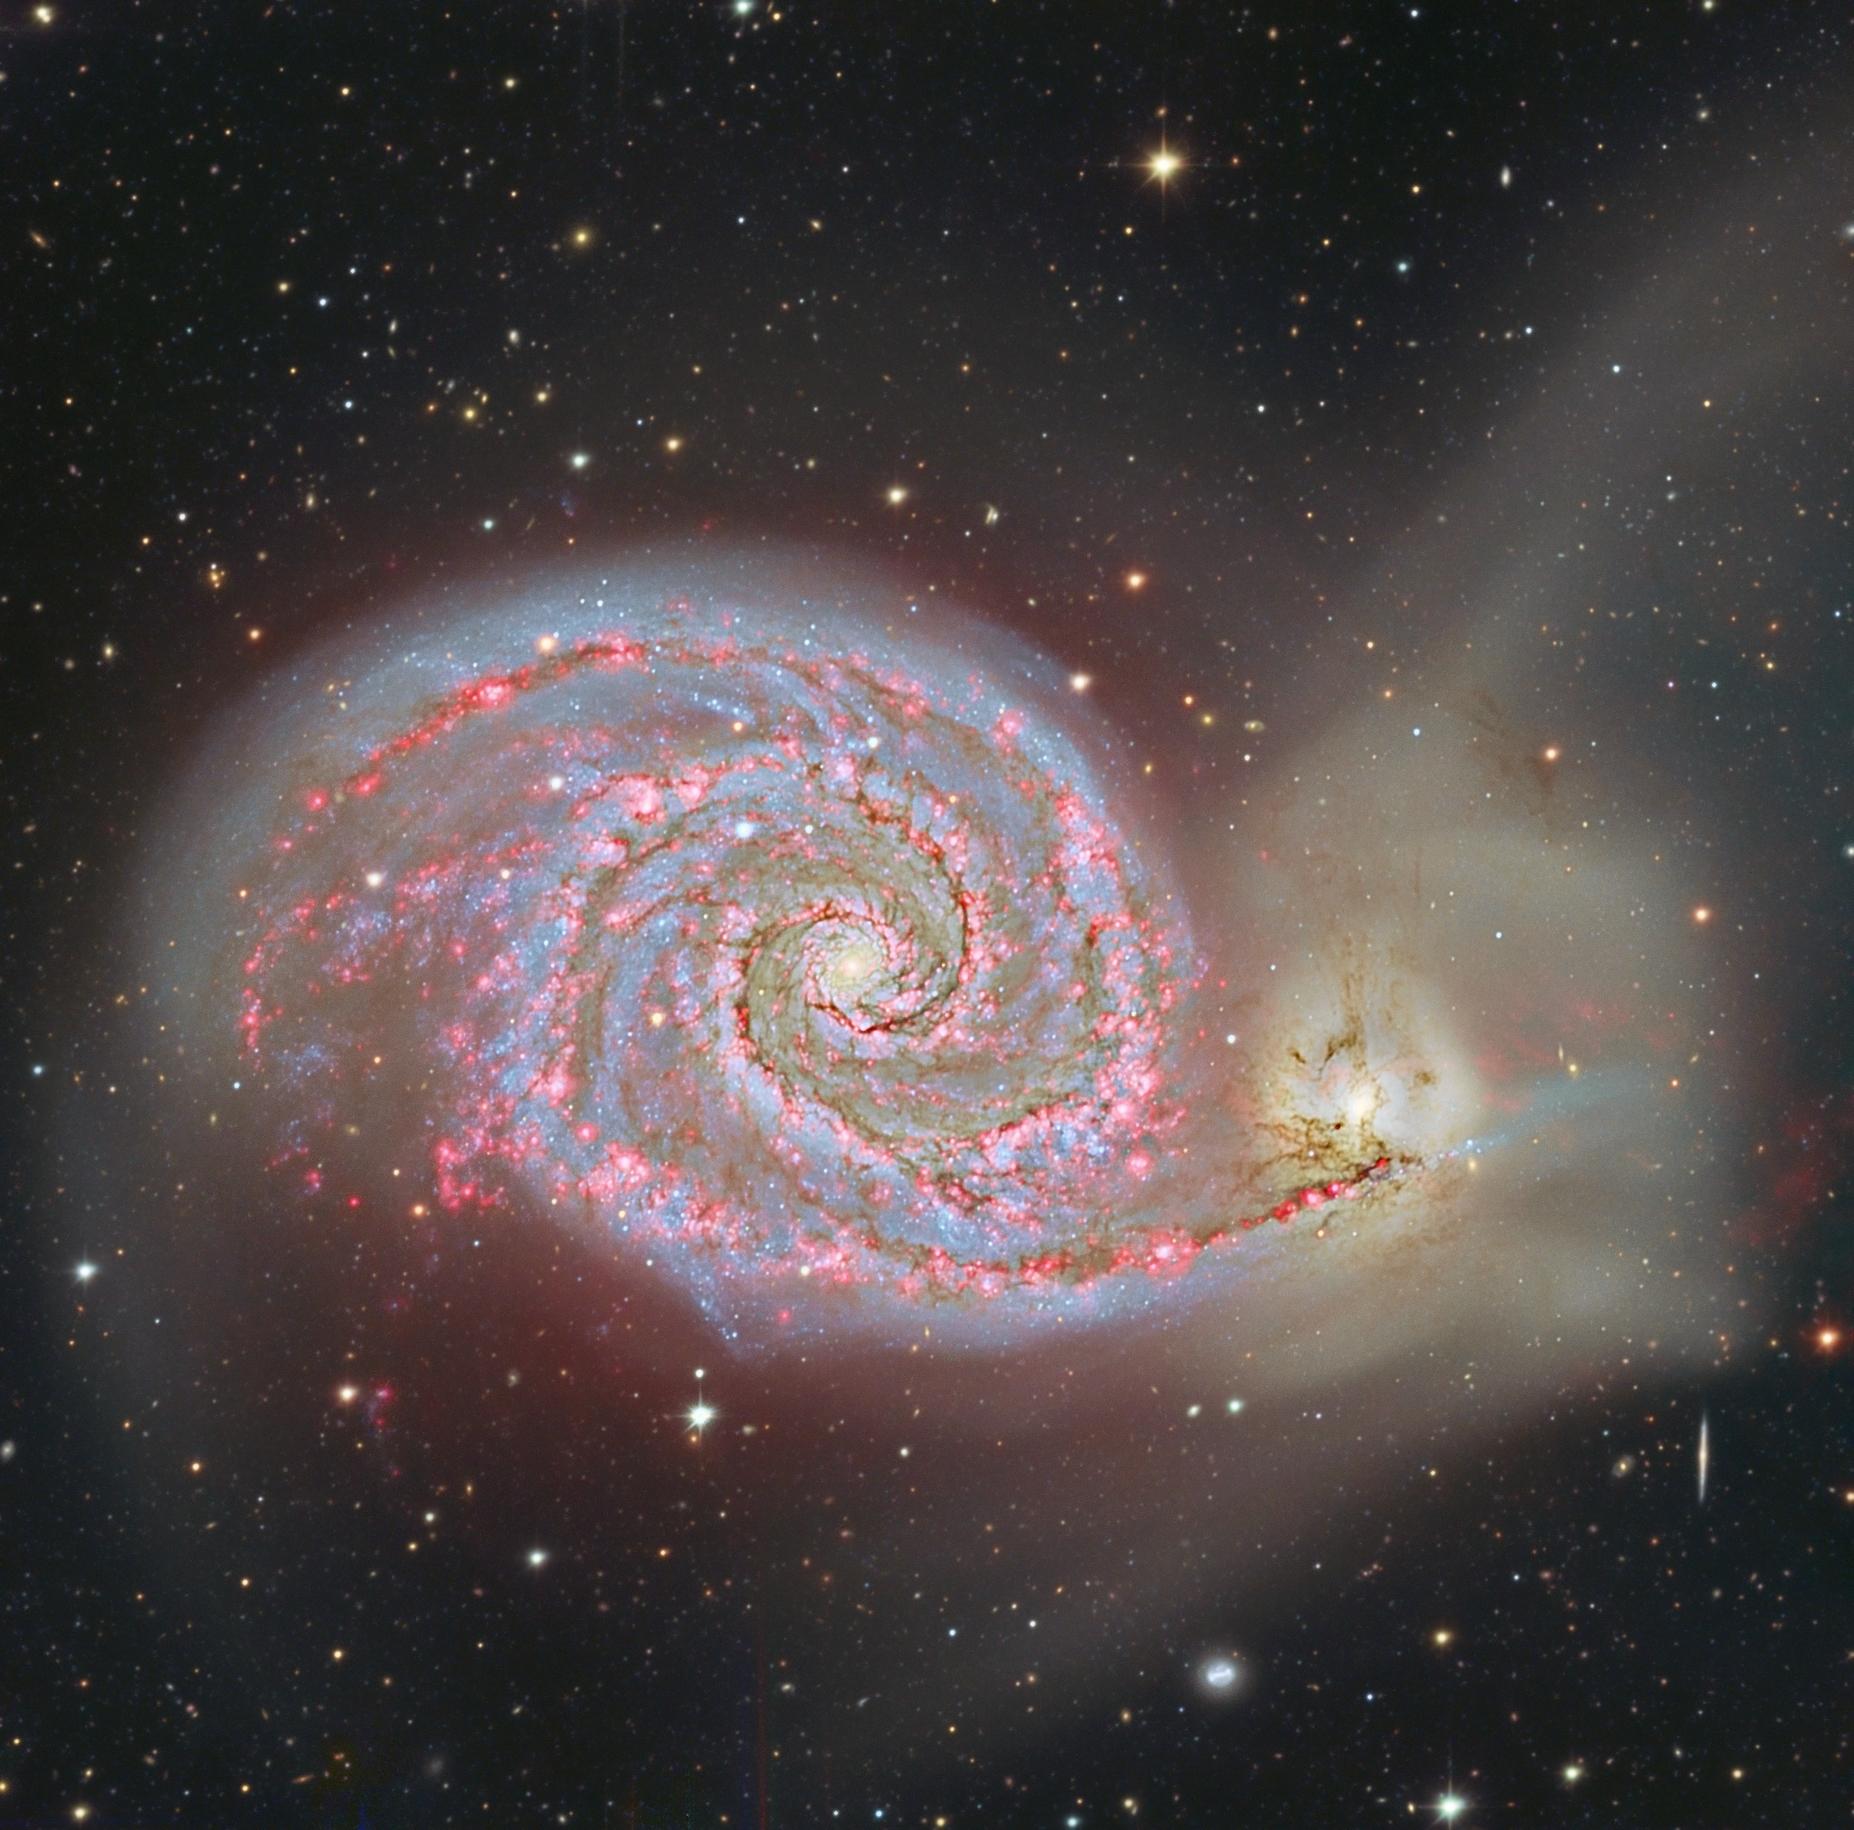 nasa whirlpool galaxy - photo #21